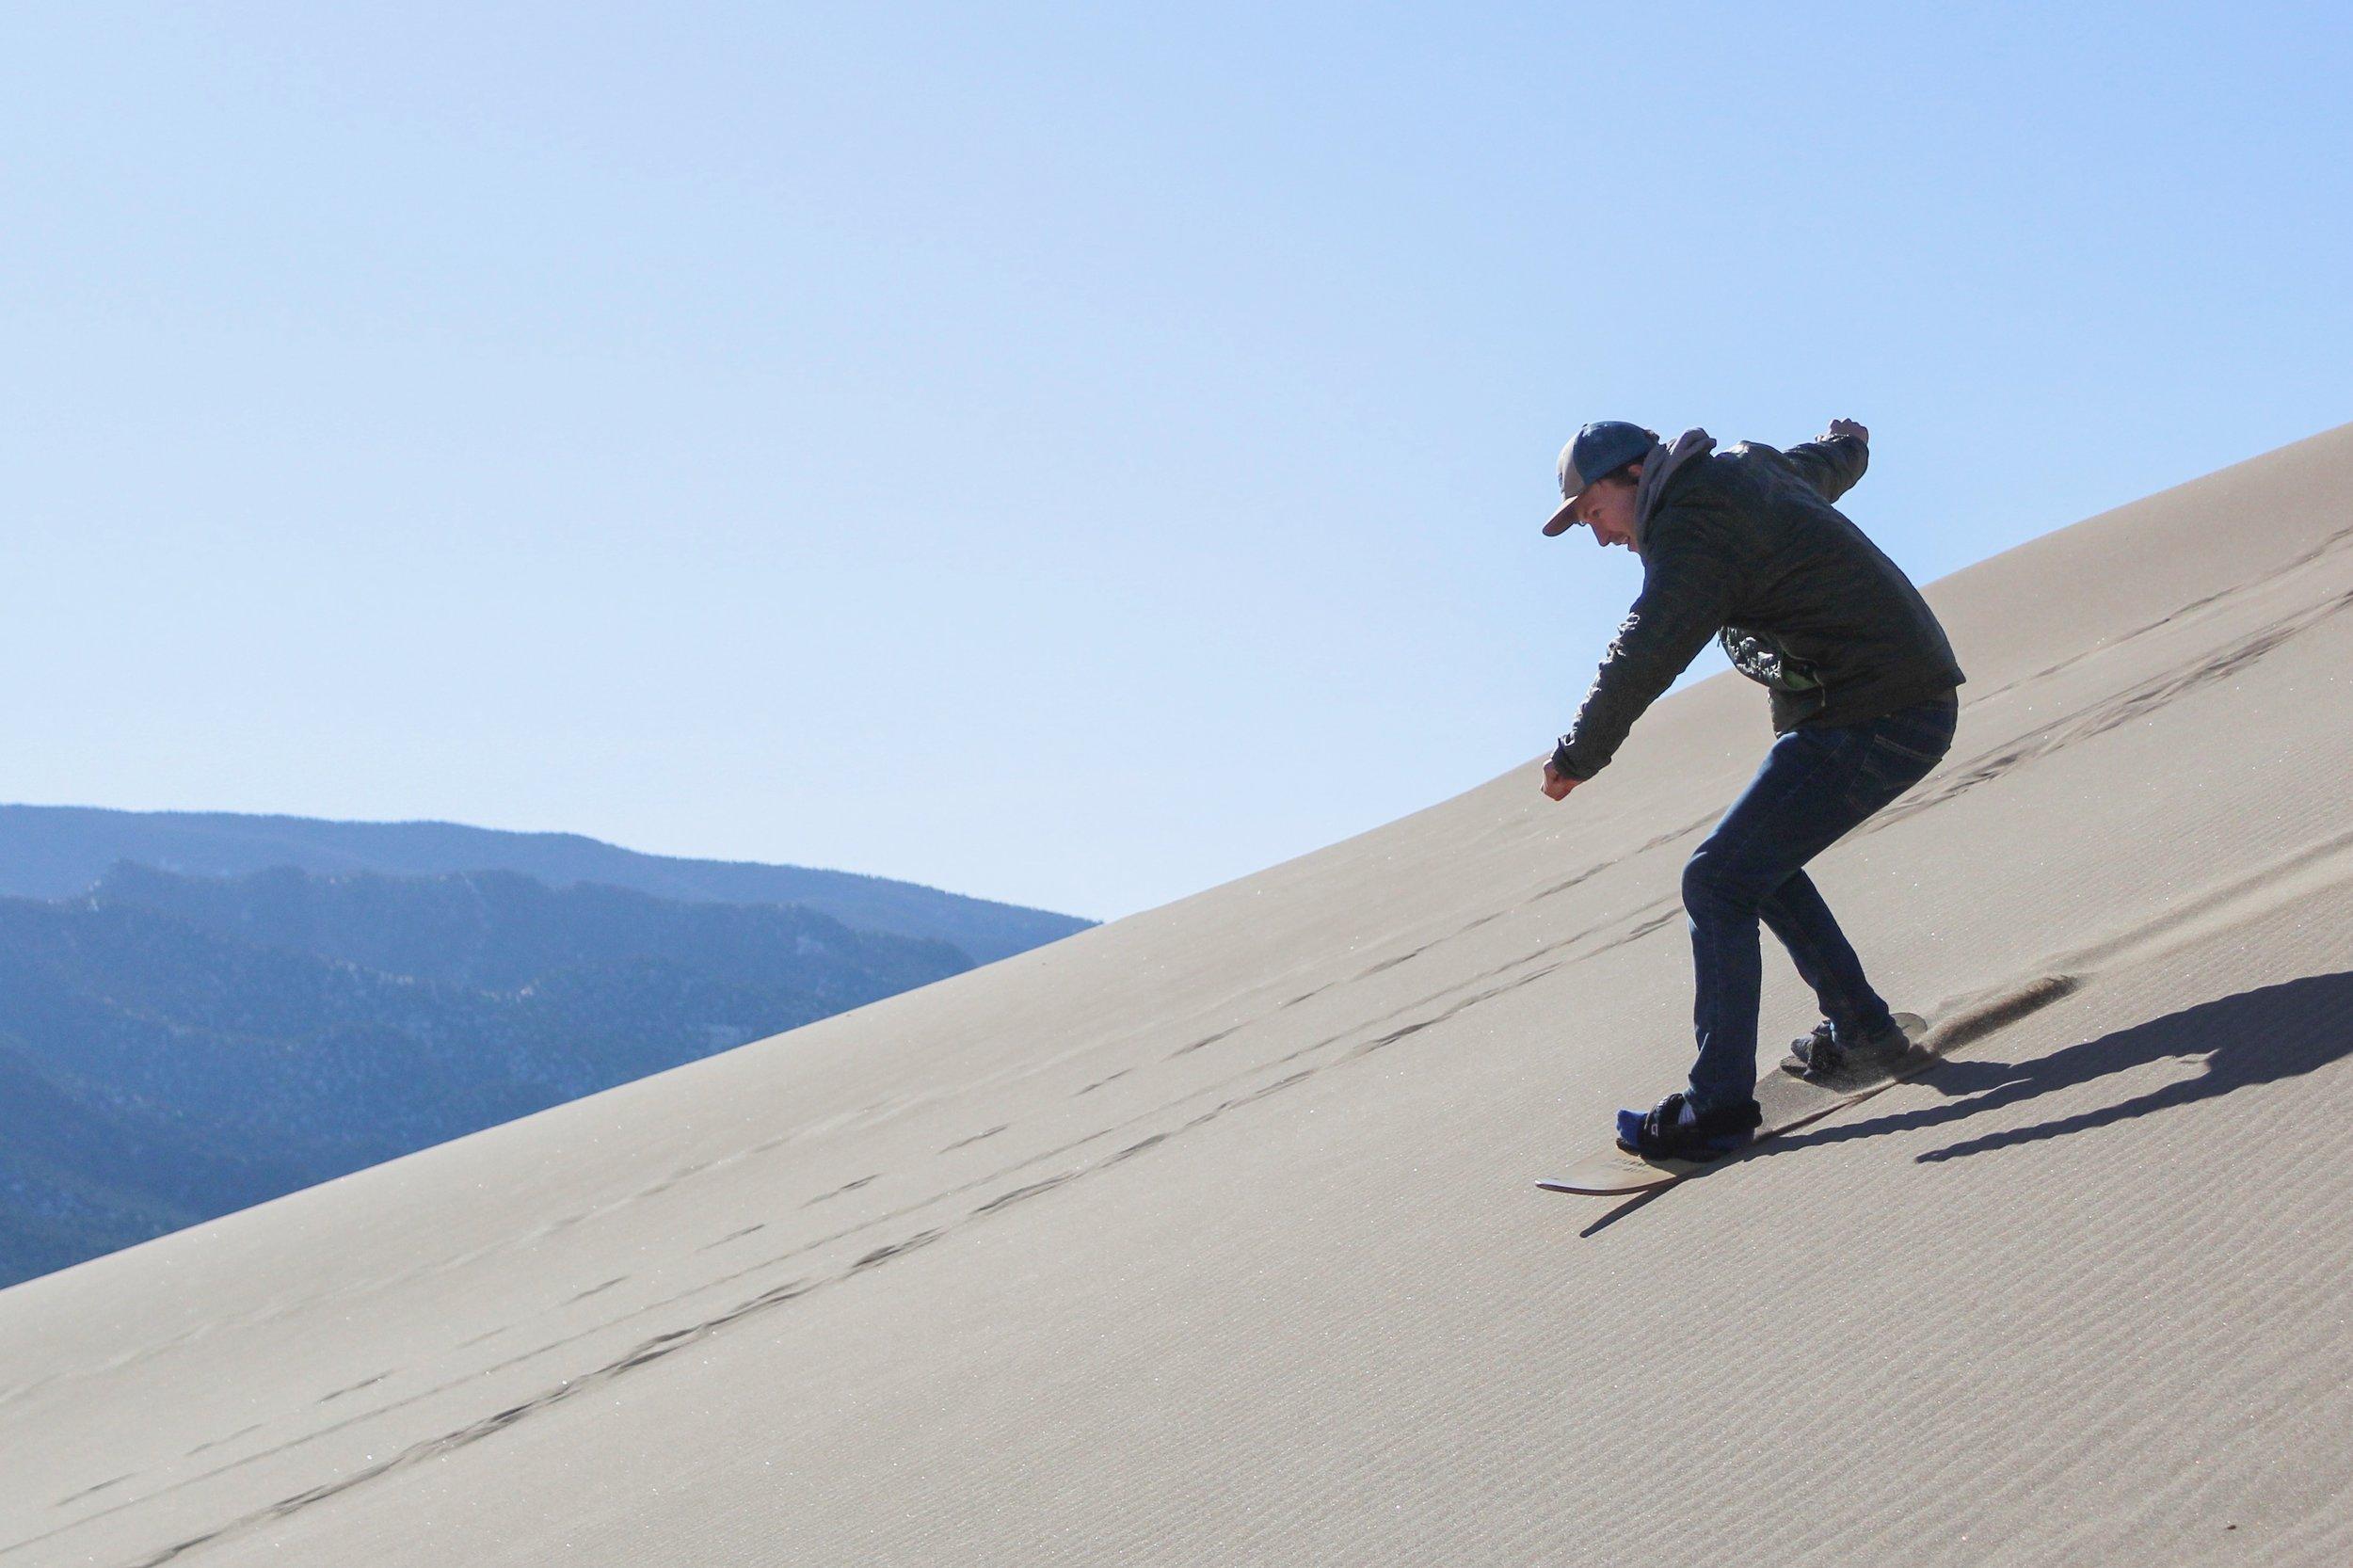 Sandboarding in Great Sand Dunes National Park